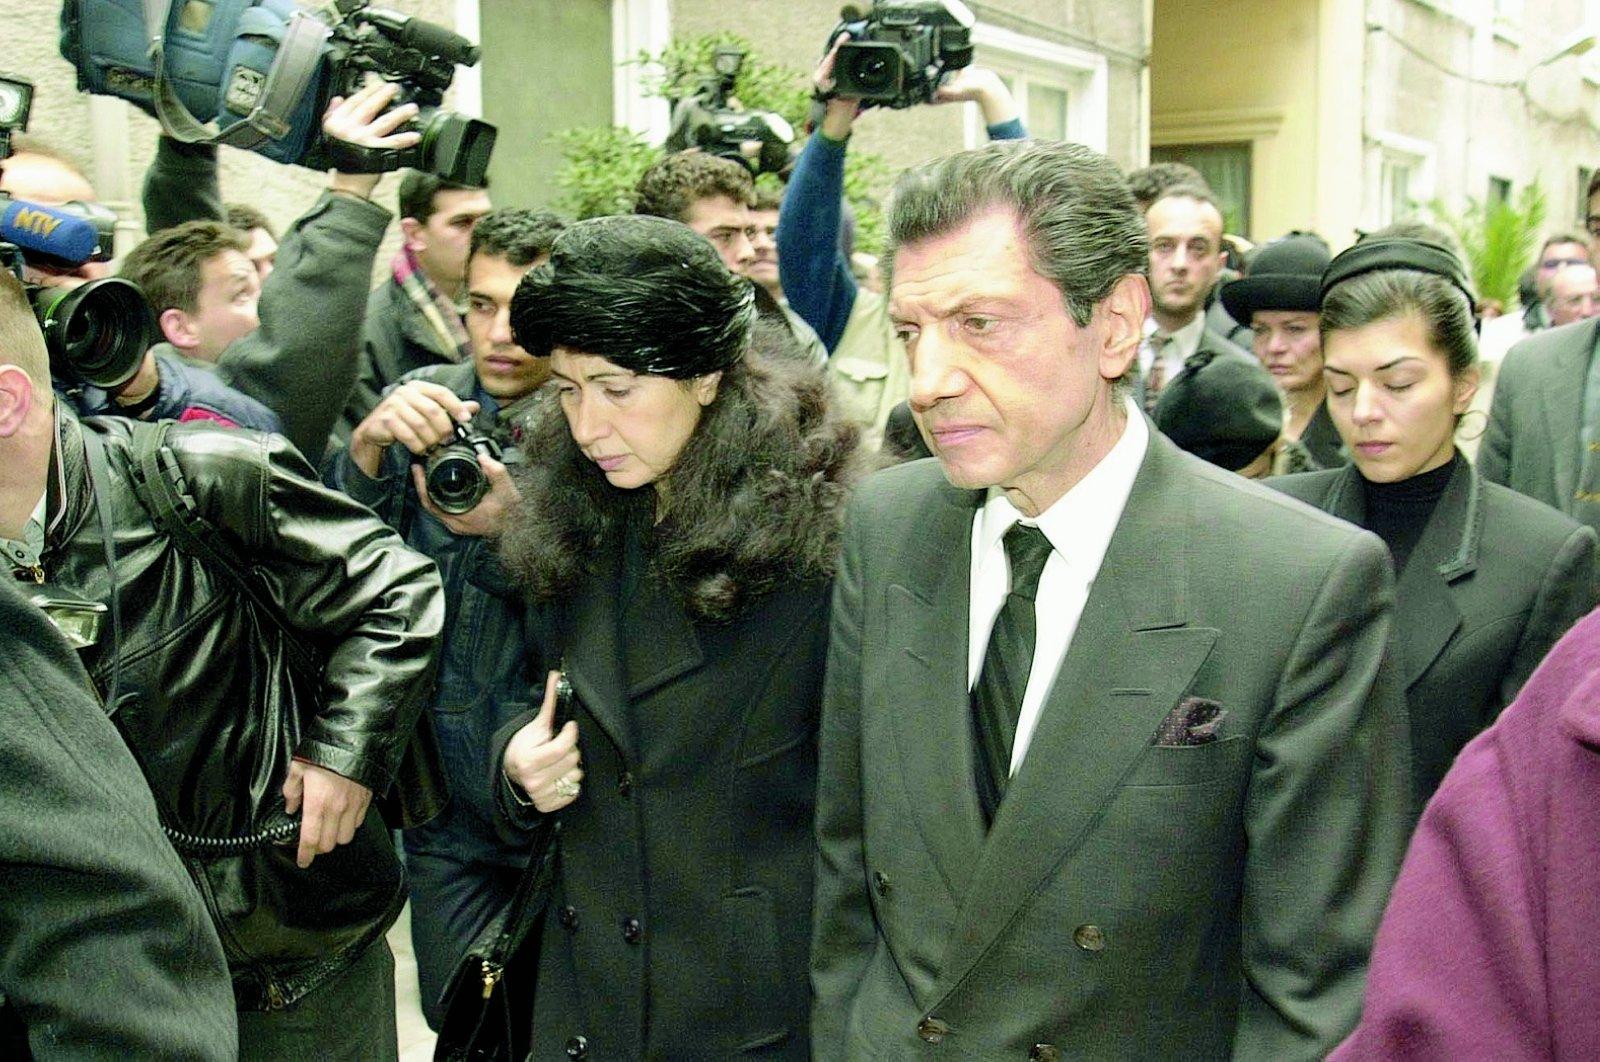 Kerope Çilingir (R) attends Matild Manukyan's funeral in Istanbul, Turkey, Feb. 22, 2001. (Photo by Recai Kömür)